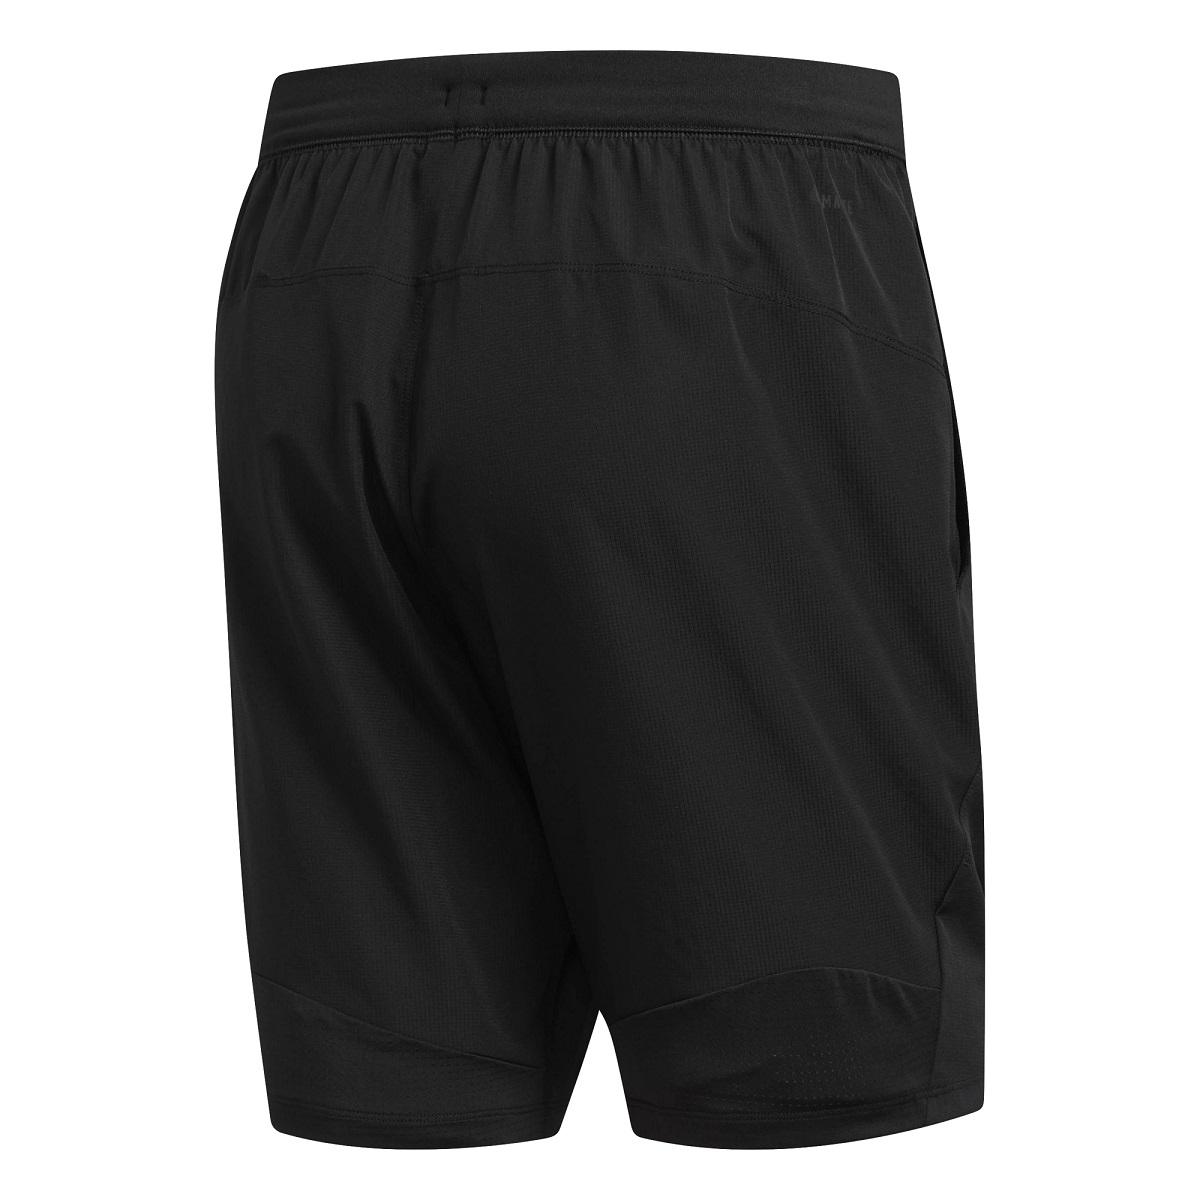 Shorts Adidas 4K 8 Polegadas